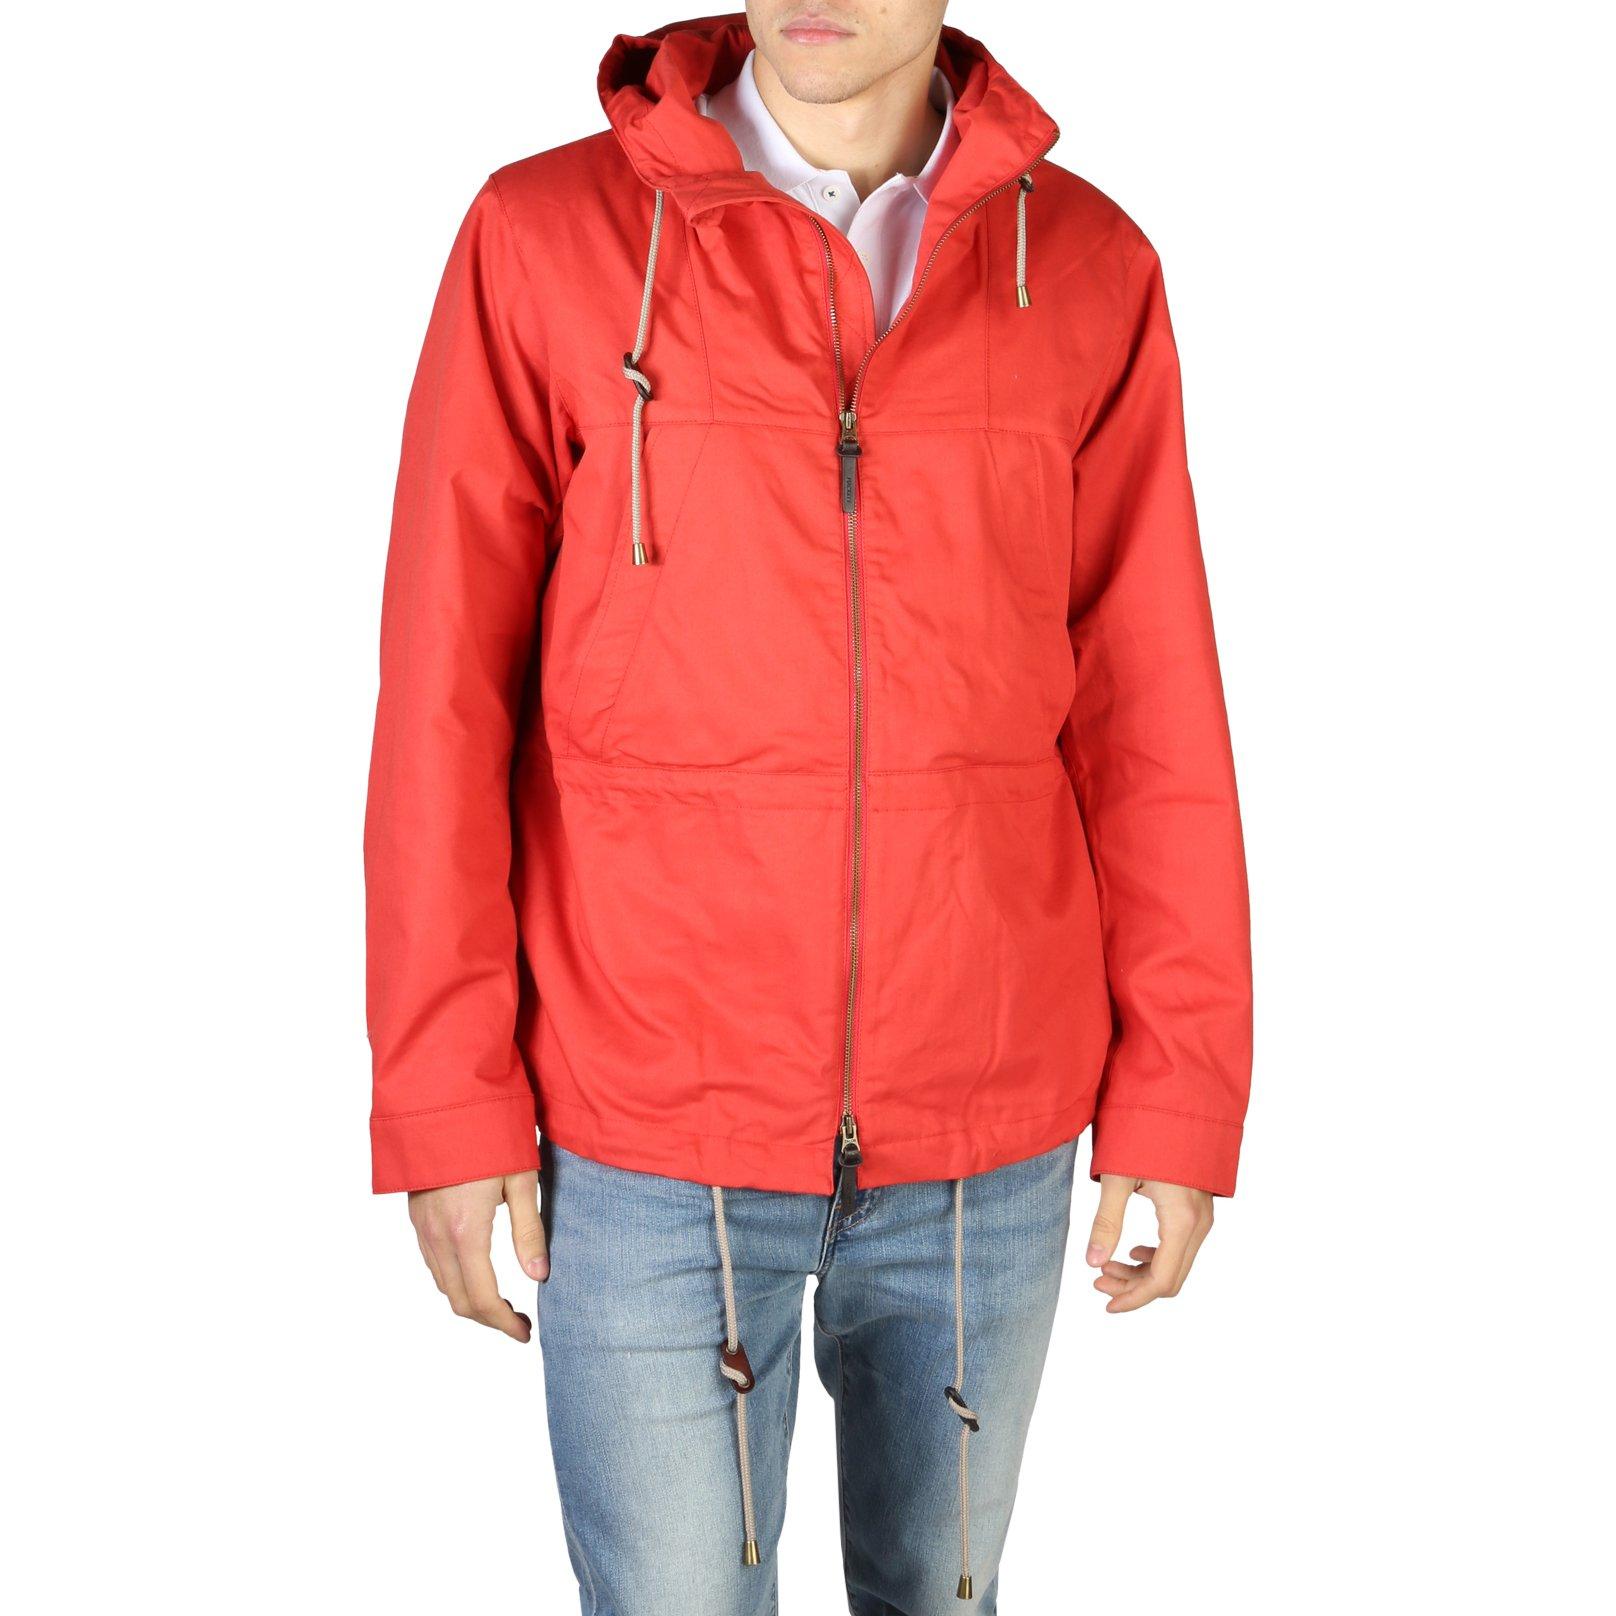 Hackett Men's Jacket Various Colours HM402150 - red XS